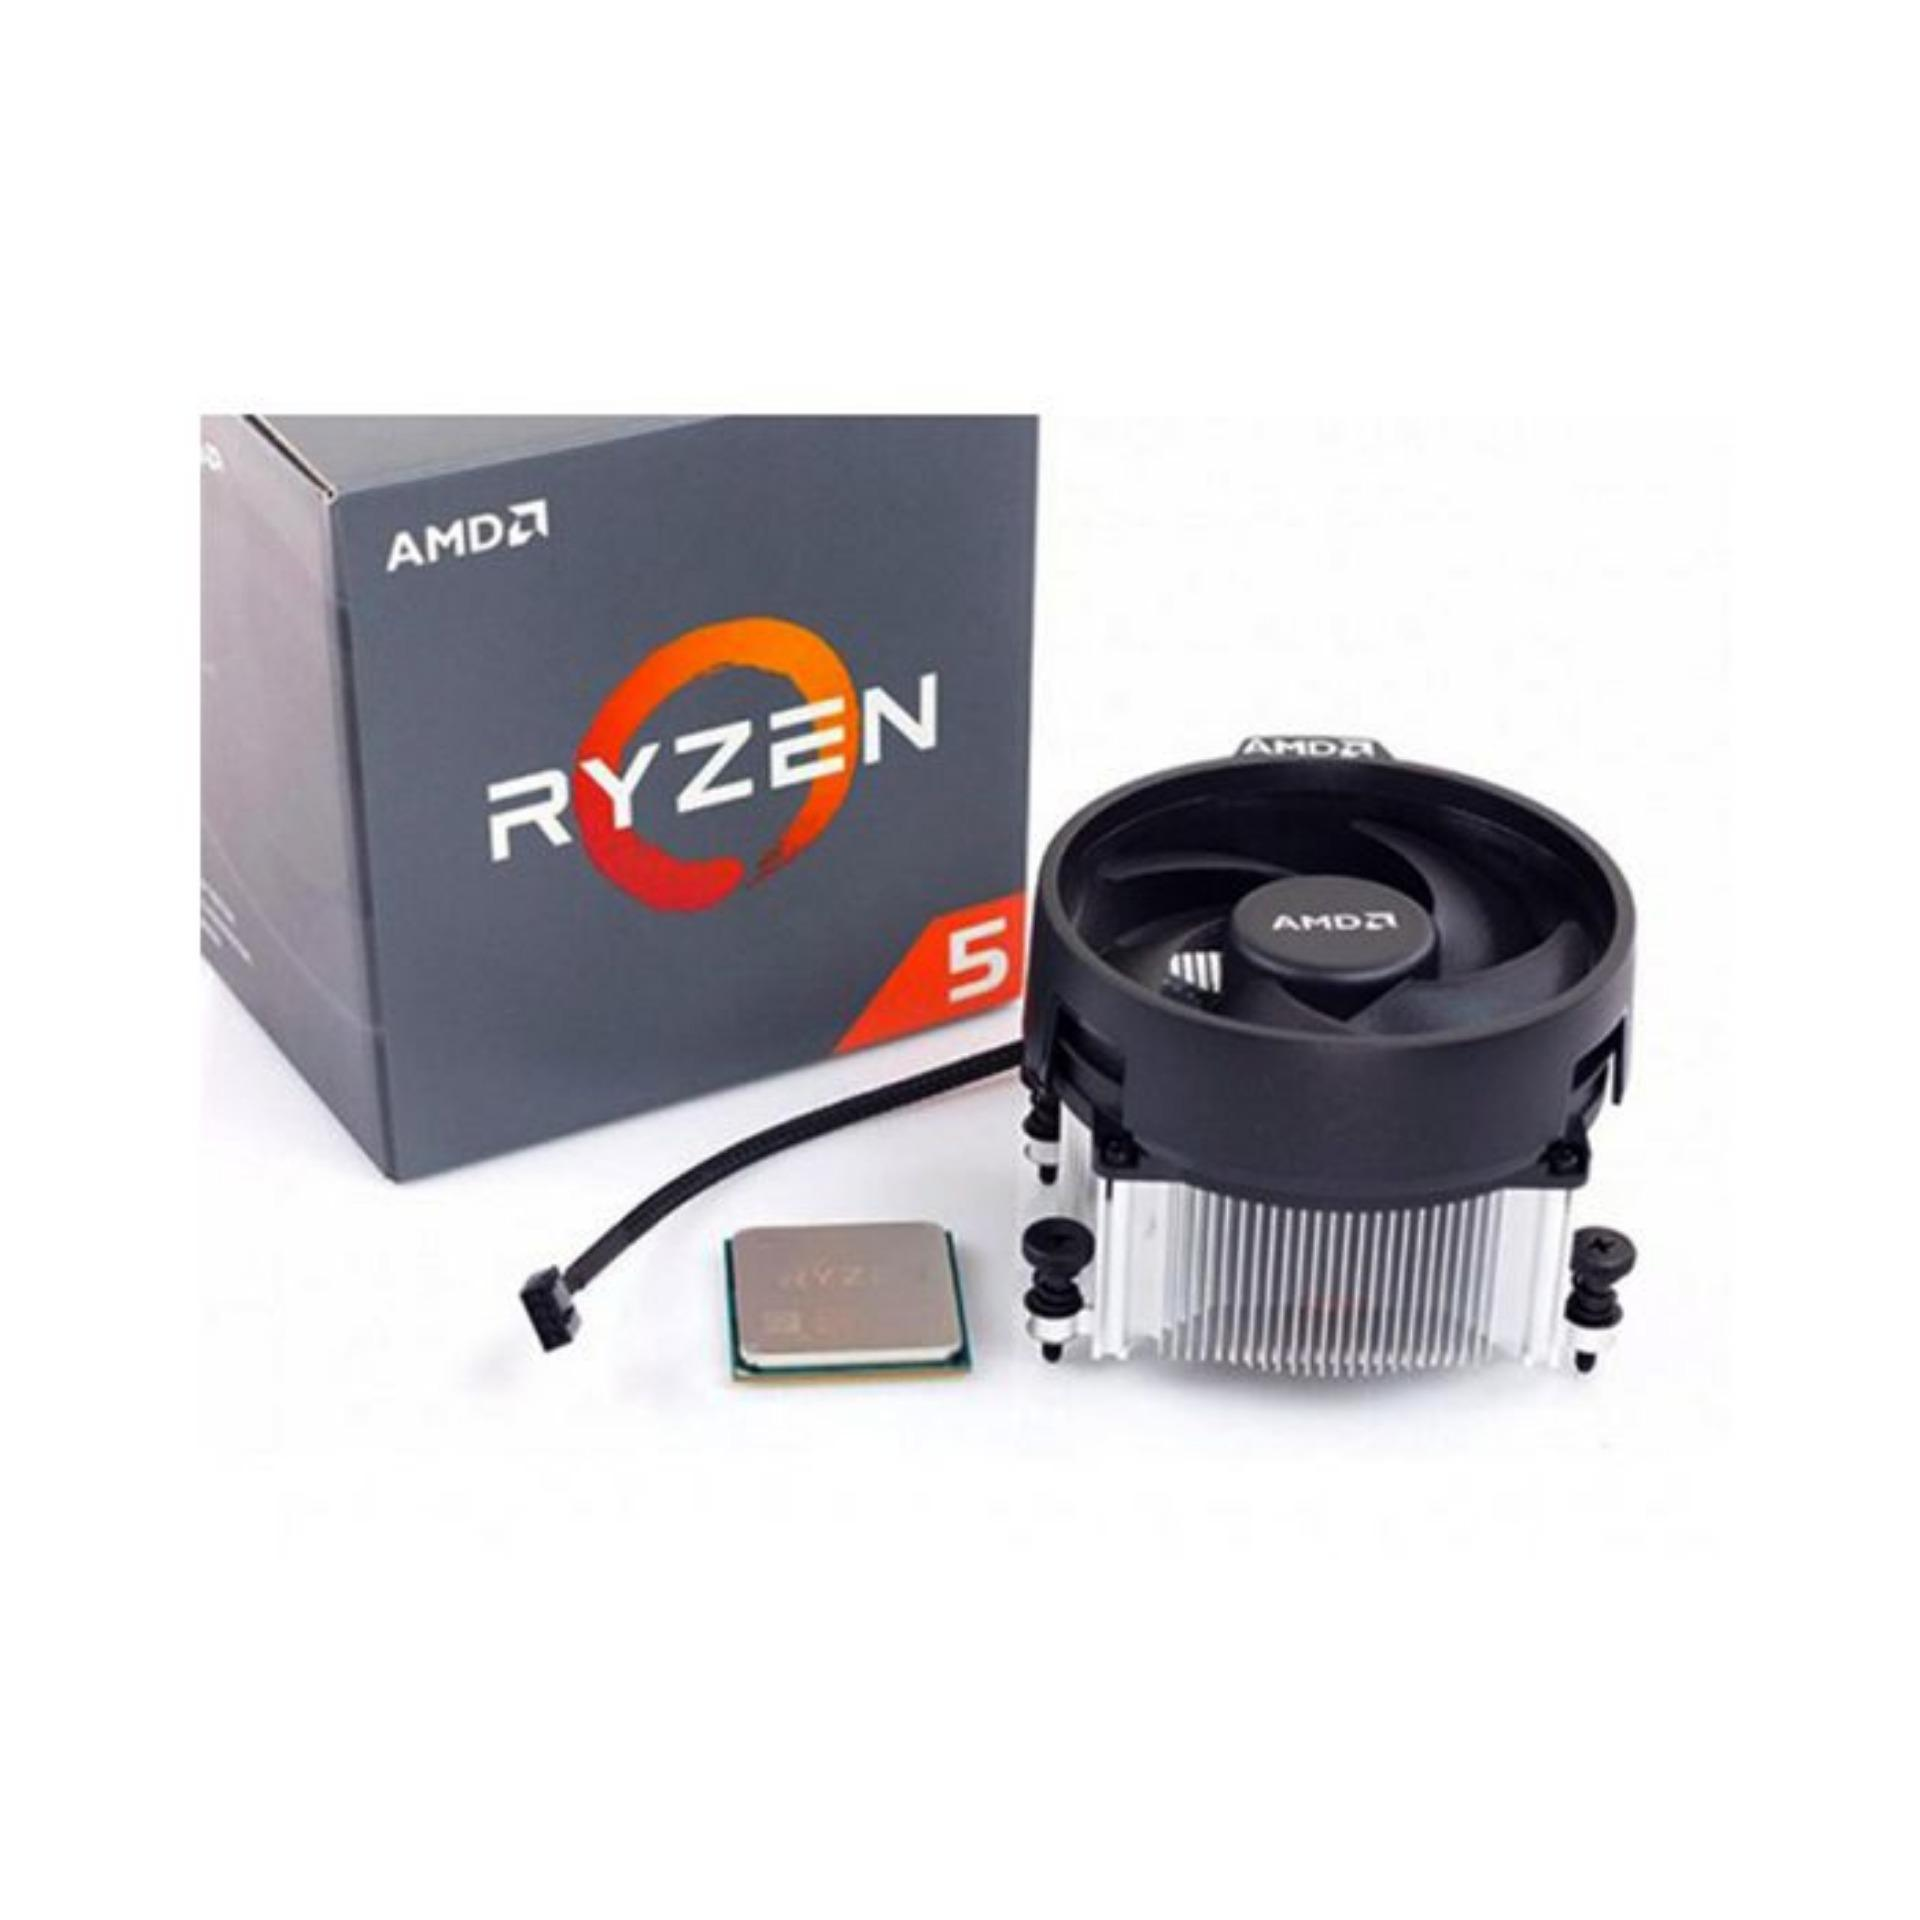 Amd Ryzen 5 1400 32 Ghz Quad Core Am4 Processor With Free Gigabyte Box A8 7650k Kaveri 33 Socket Fm2 95w 1600 32ghz 1138340 Update